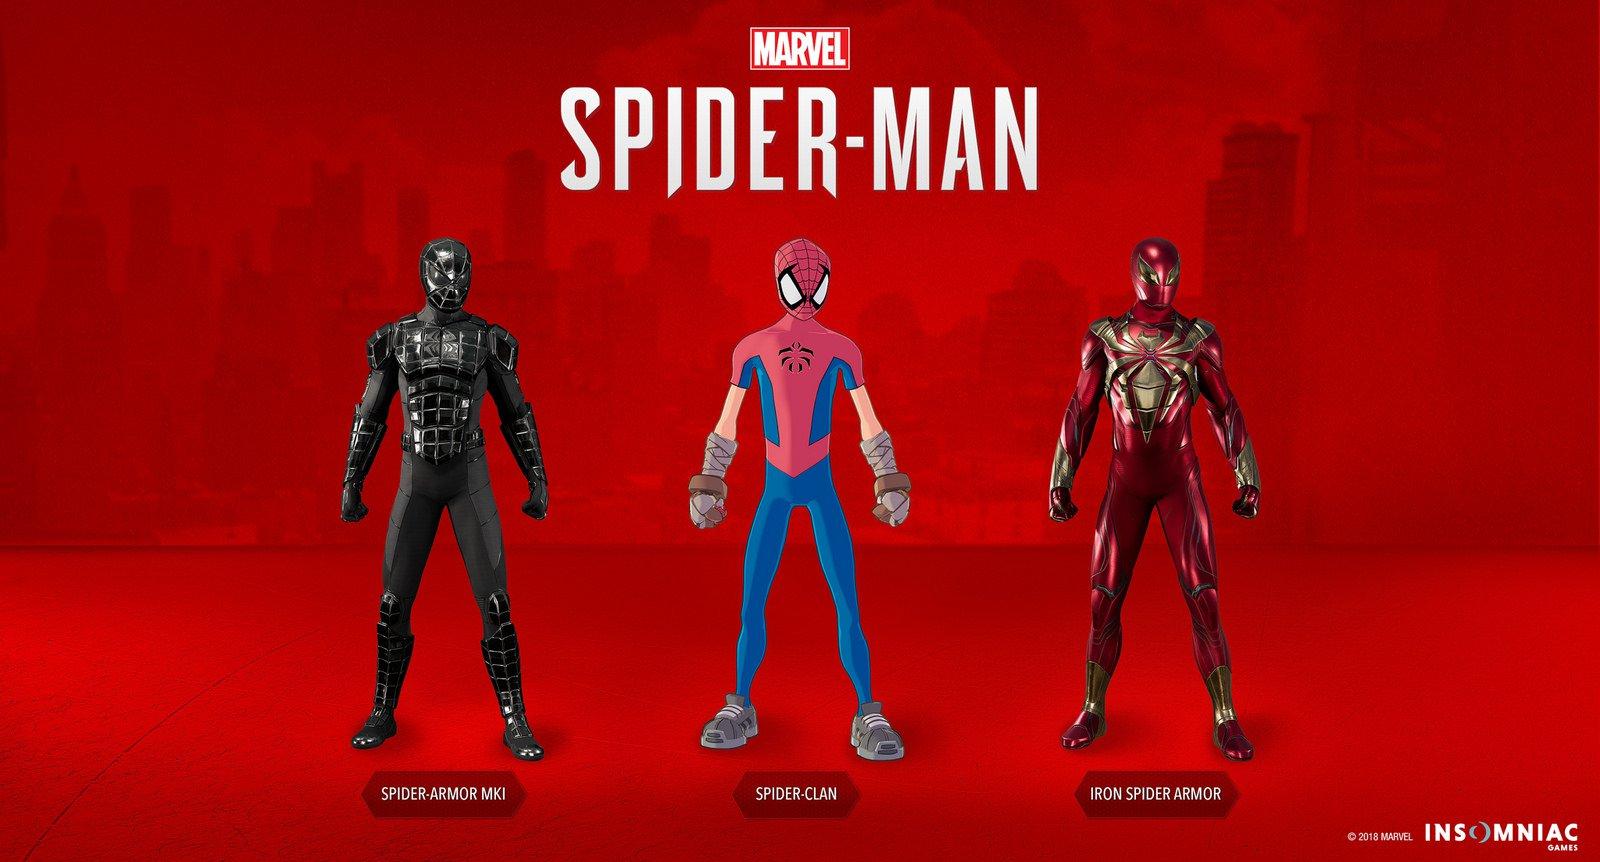 Marvels Spider-Man Turf Wars 2